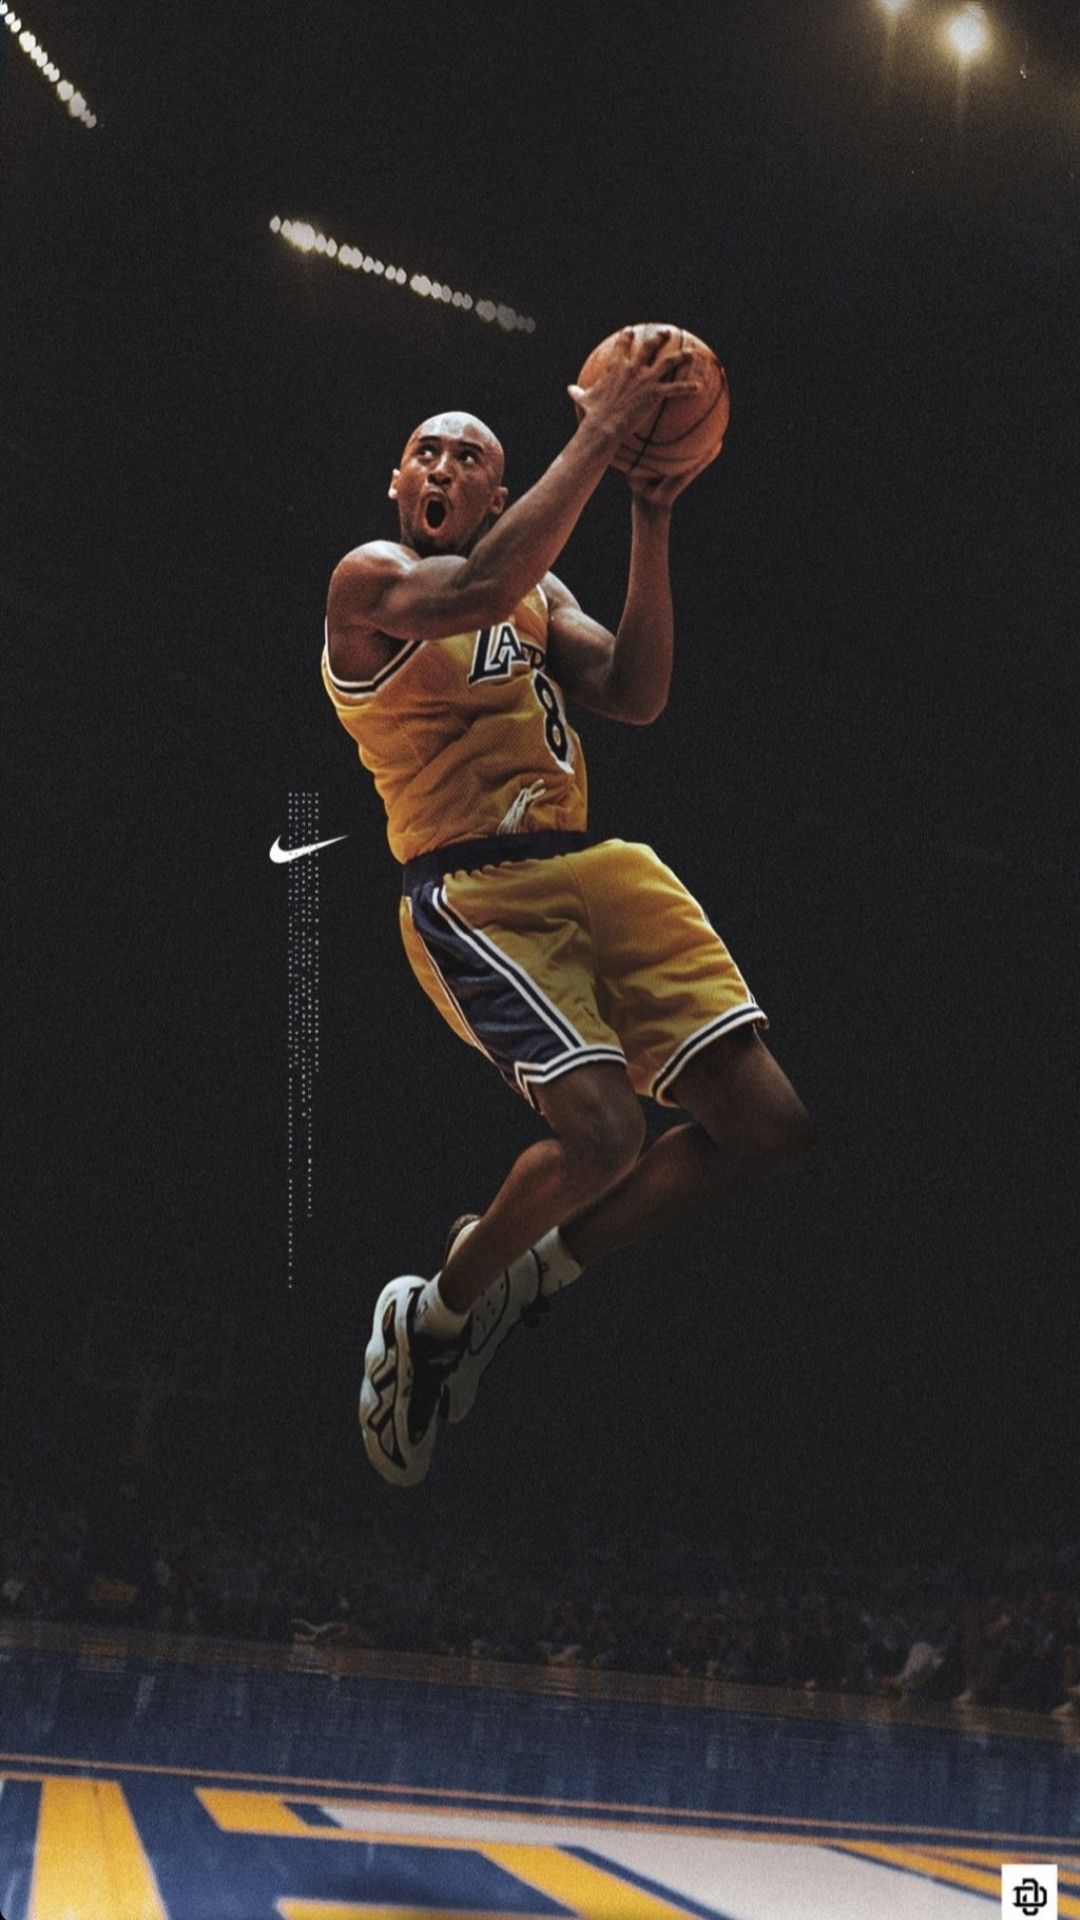 Kobe Bryant Wallpaper Kobe Bryant Wallpaper Kobe Bryant Pictures Kobe Bryant Dunk